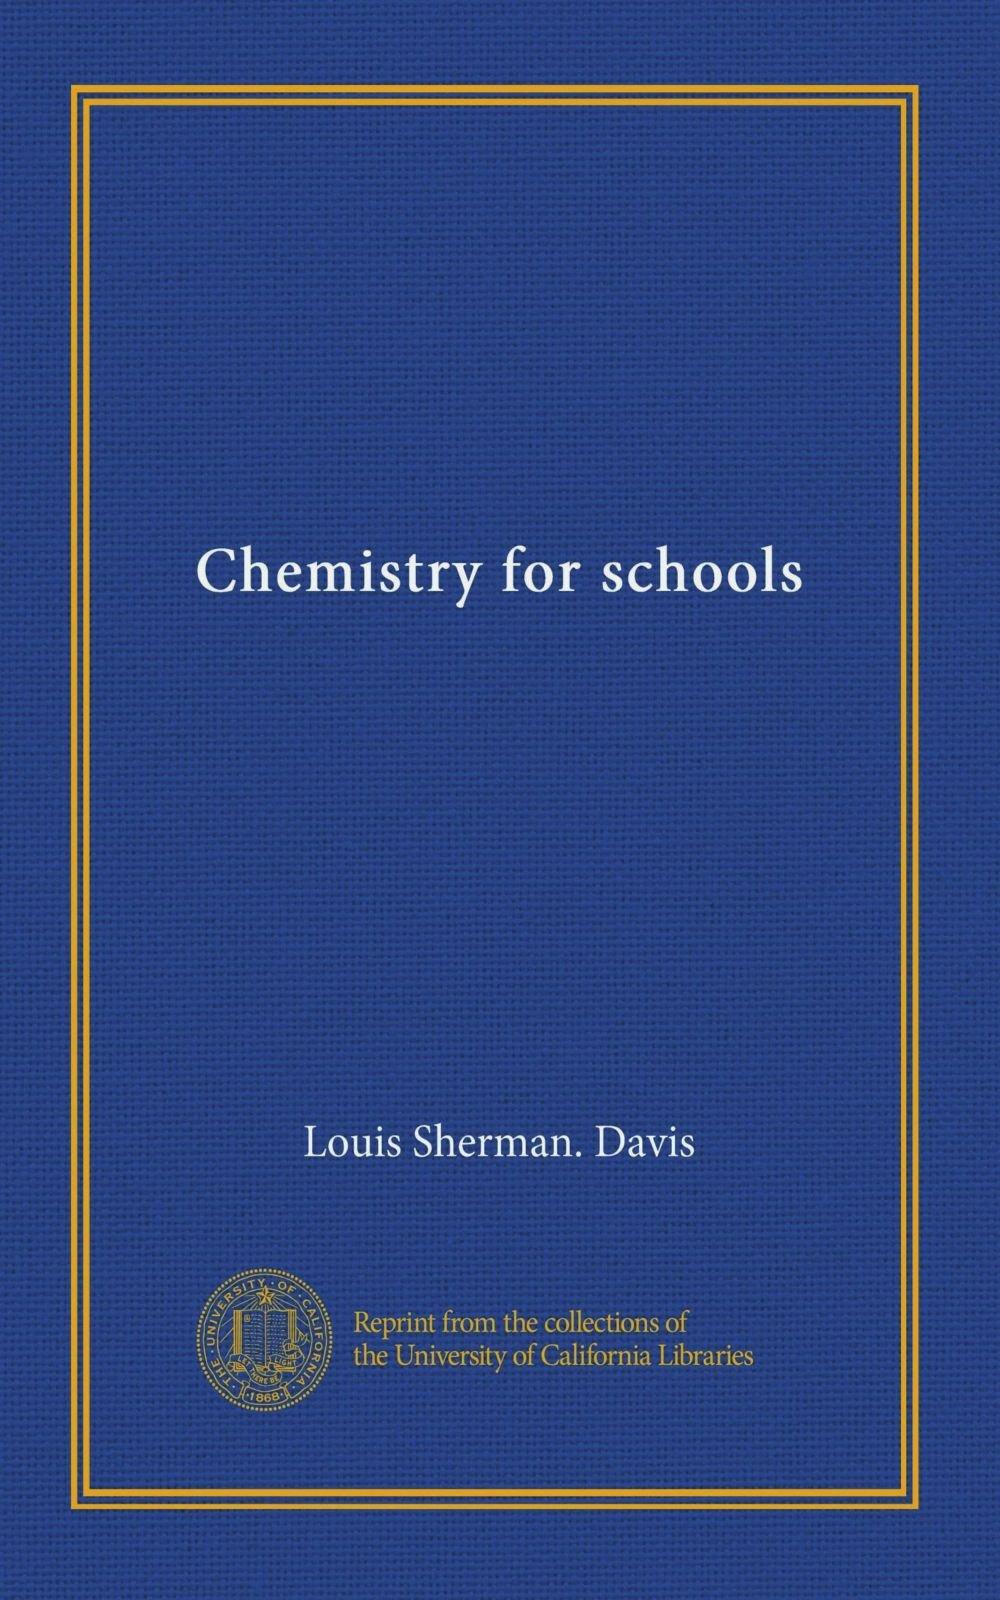 Download Chemistry for schools ebook